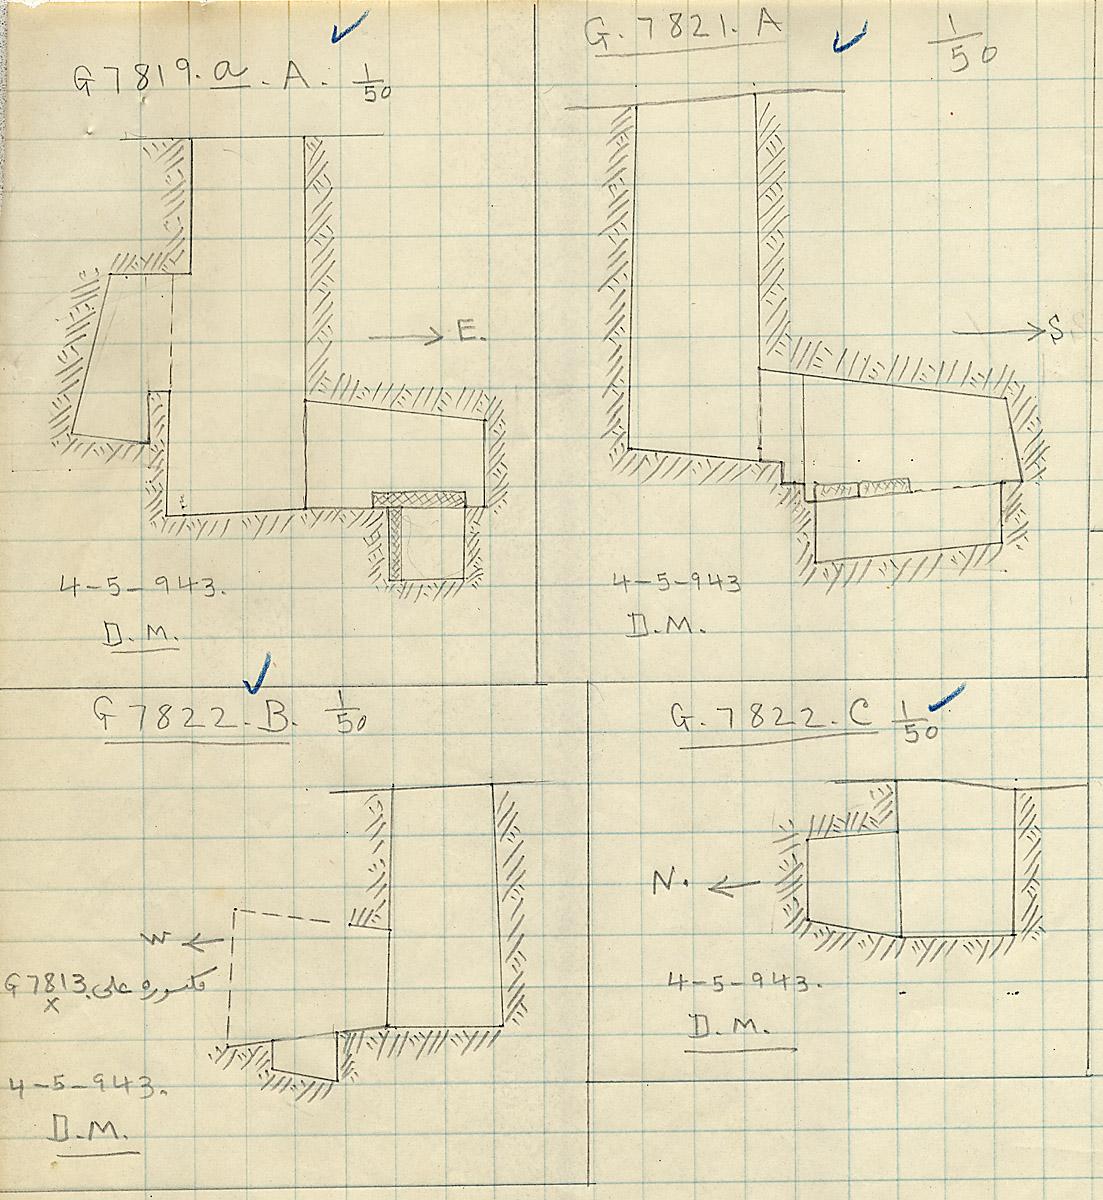 Maps and plans: G 7819a, Shaft A & G 7821, Shaft A & G 7822, Shaft B and C